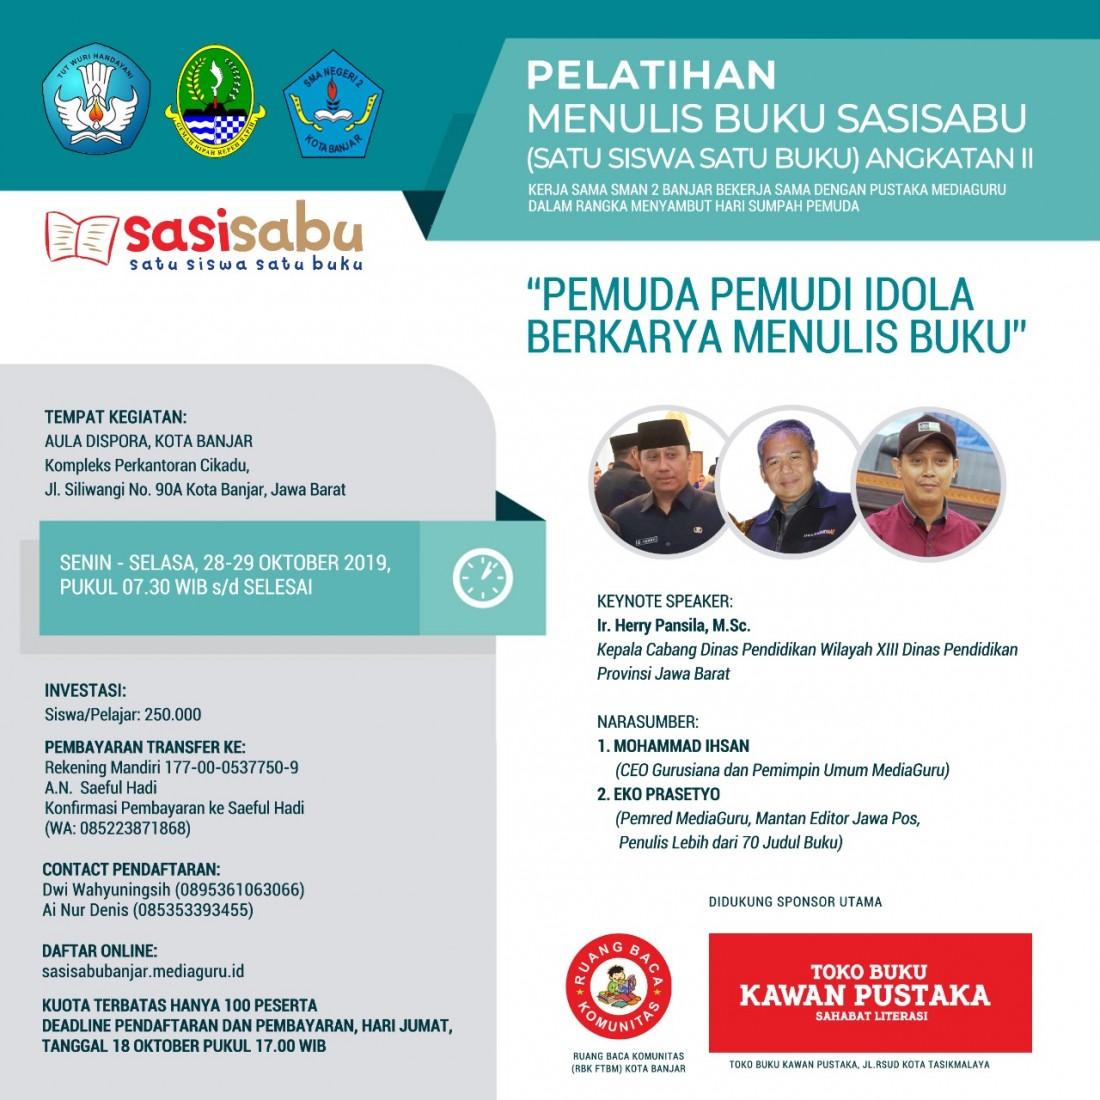 Pelatihan Menulis Satu Siswa Satu Buku (Sasisabu) Banjar (28-29 Oktober 2019)